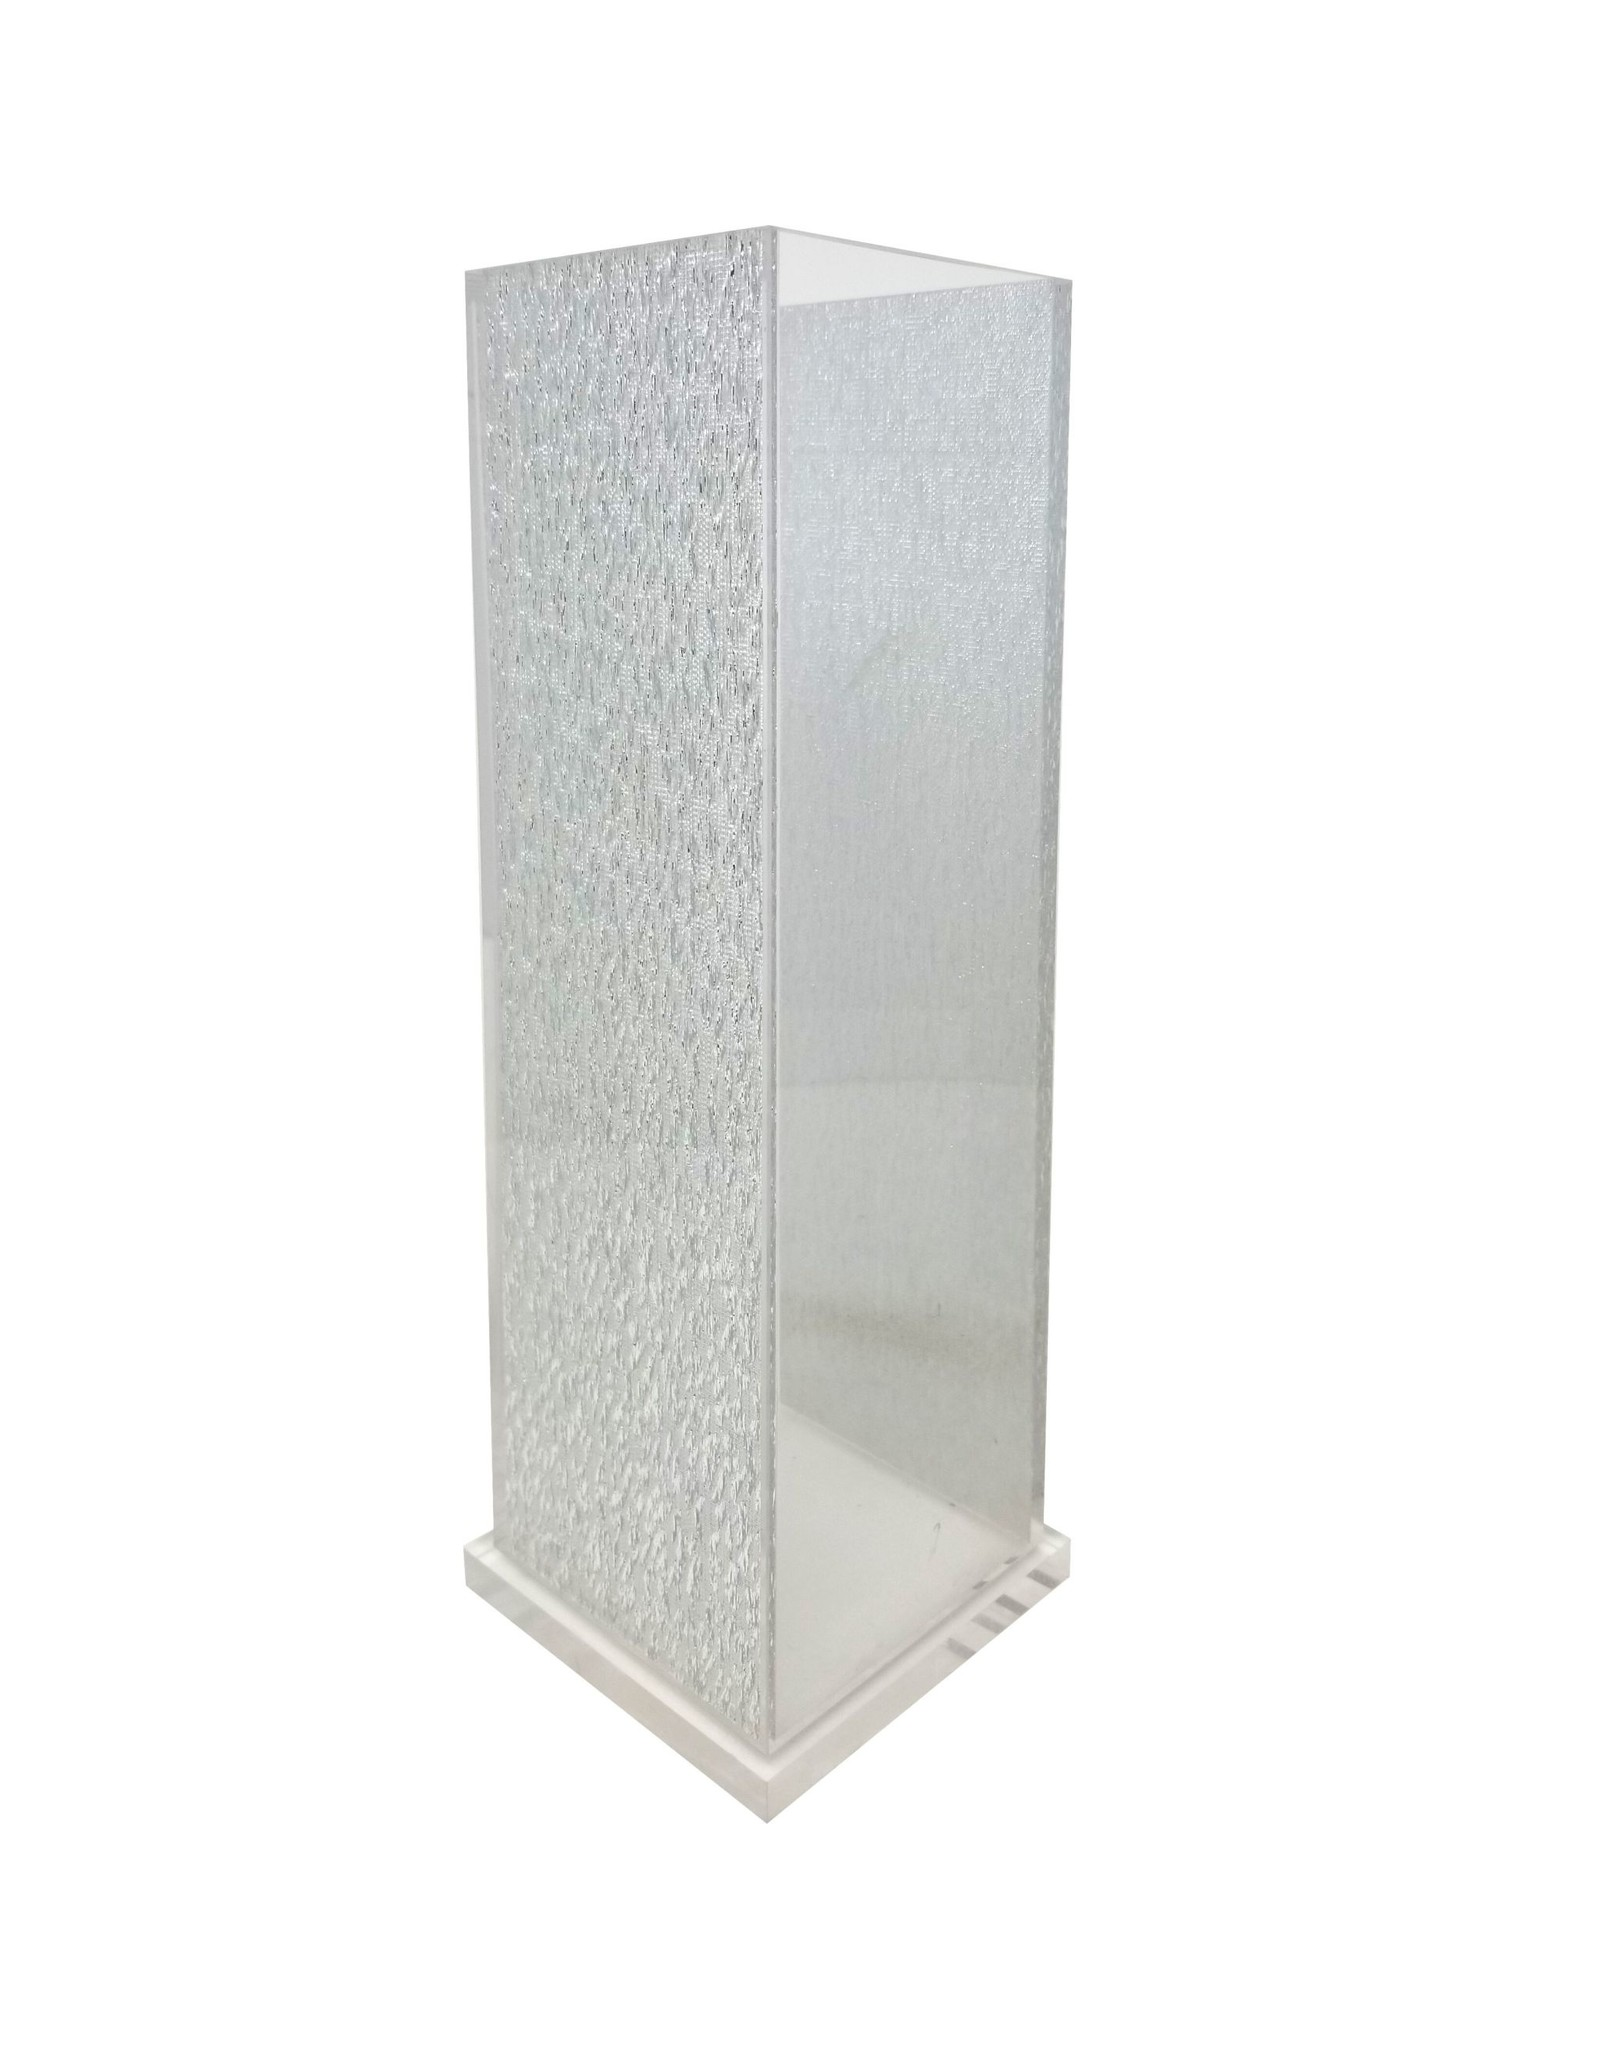 Acrylic Vase Square Sliver